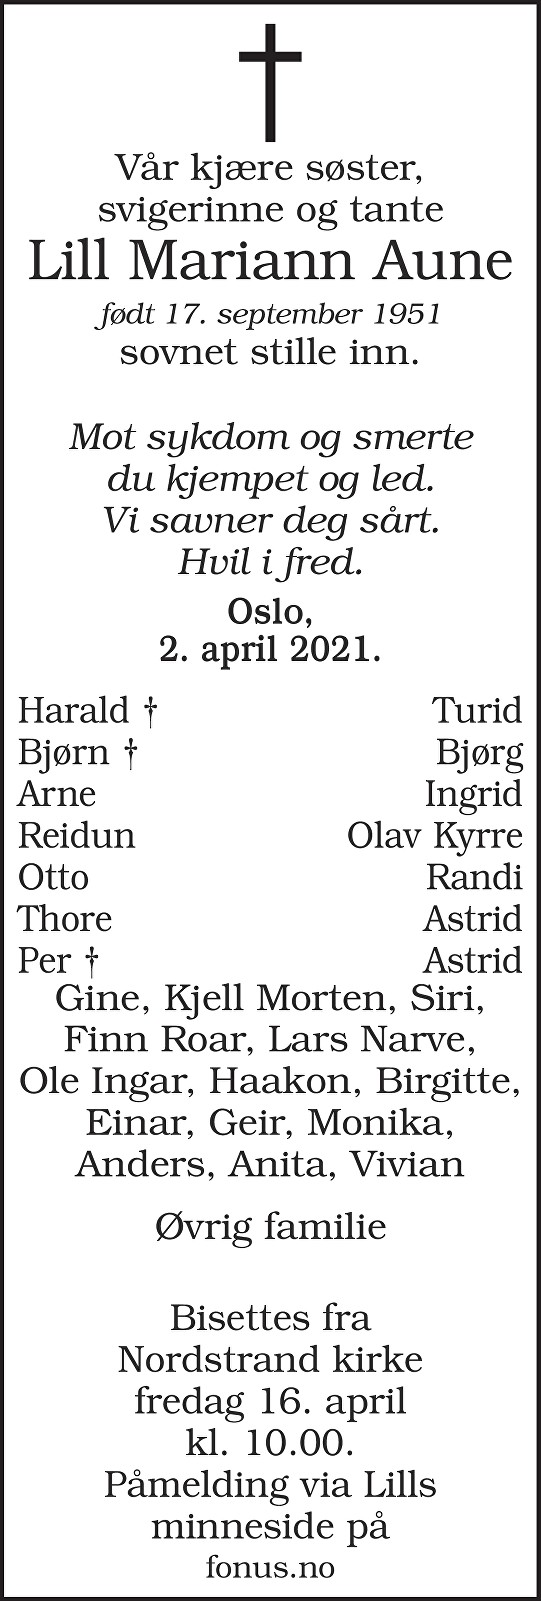 Lill Mariann Aune Dødsannonse